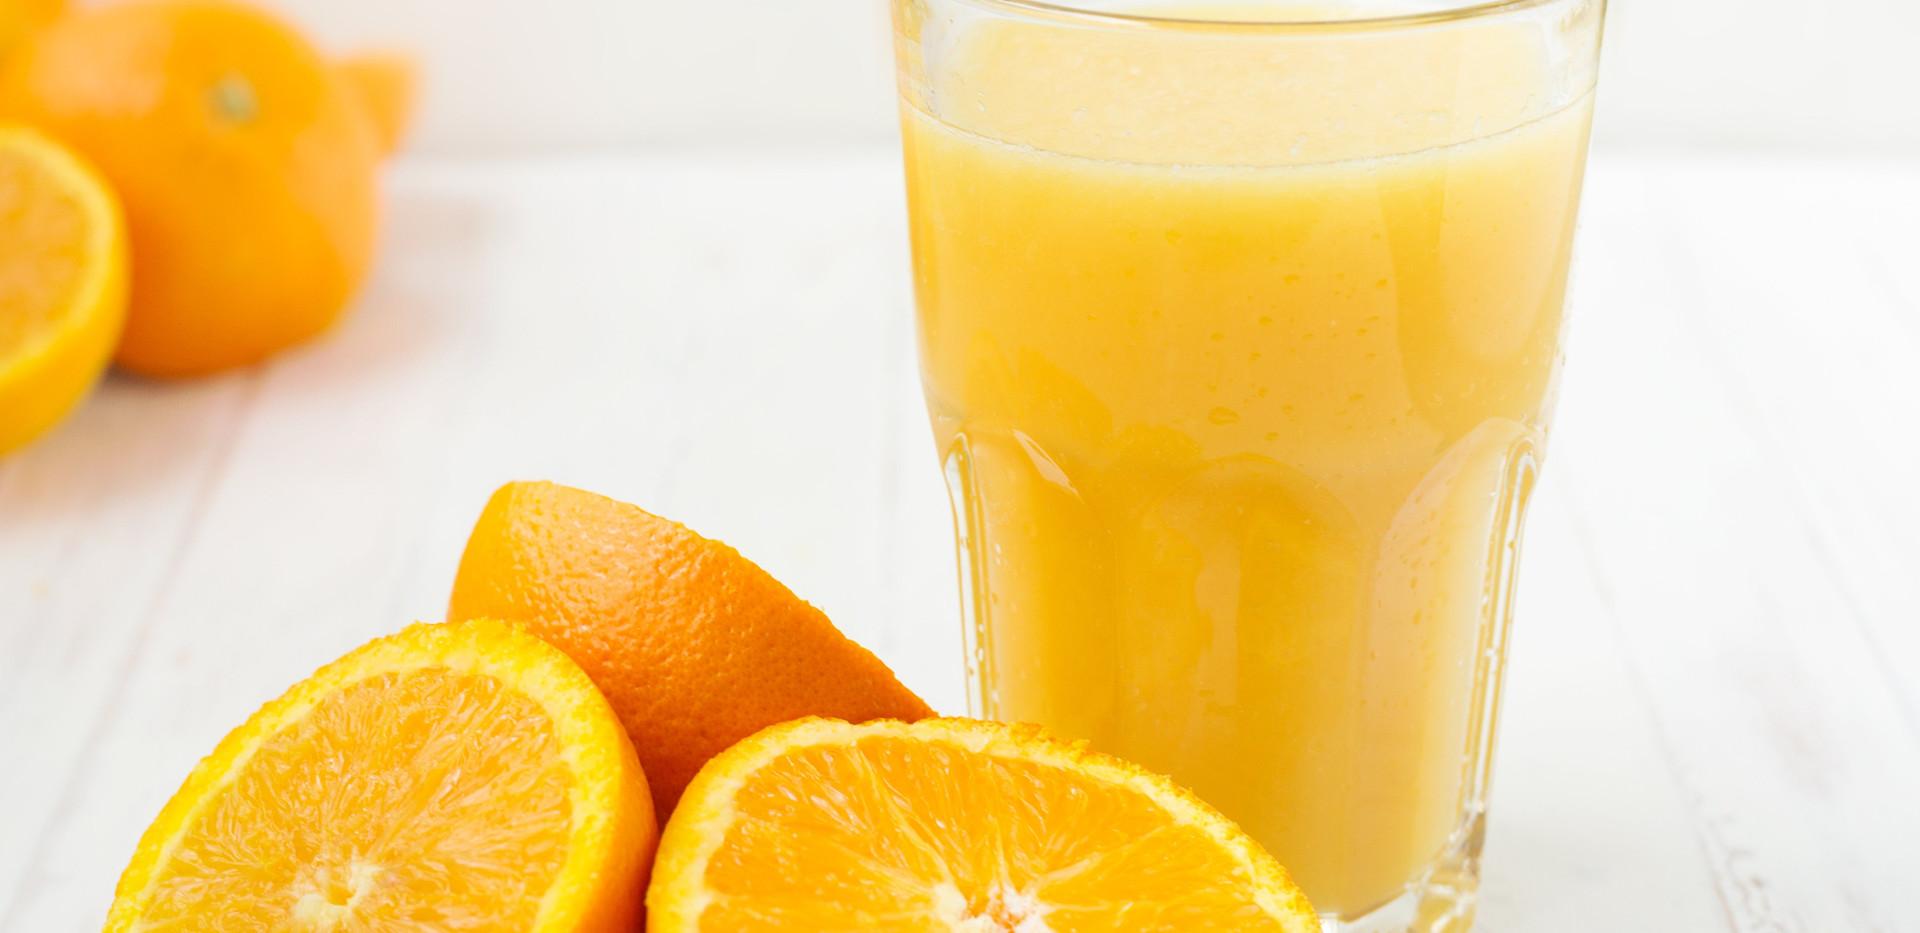 Freshly Squeezed Orange Juice